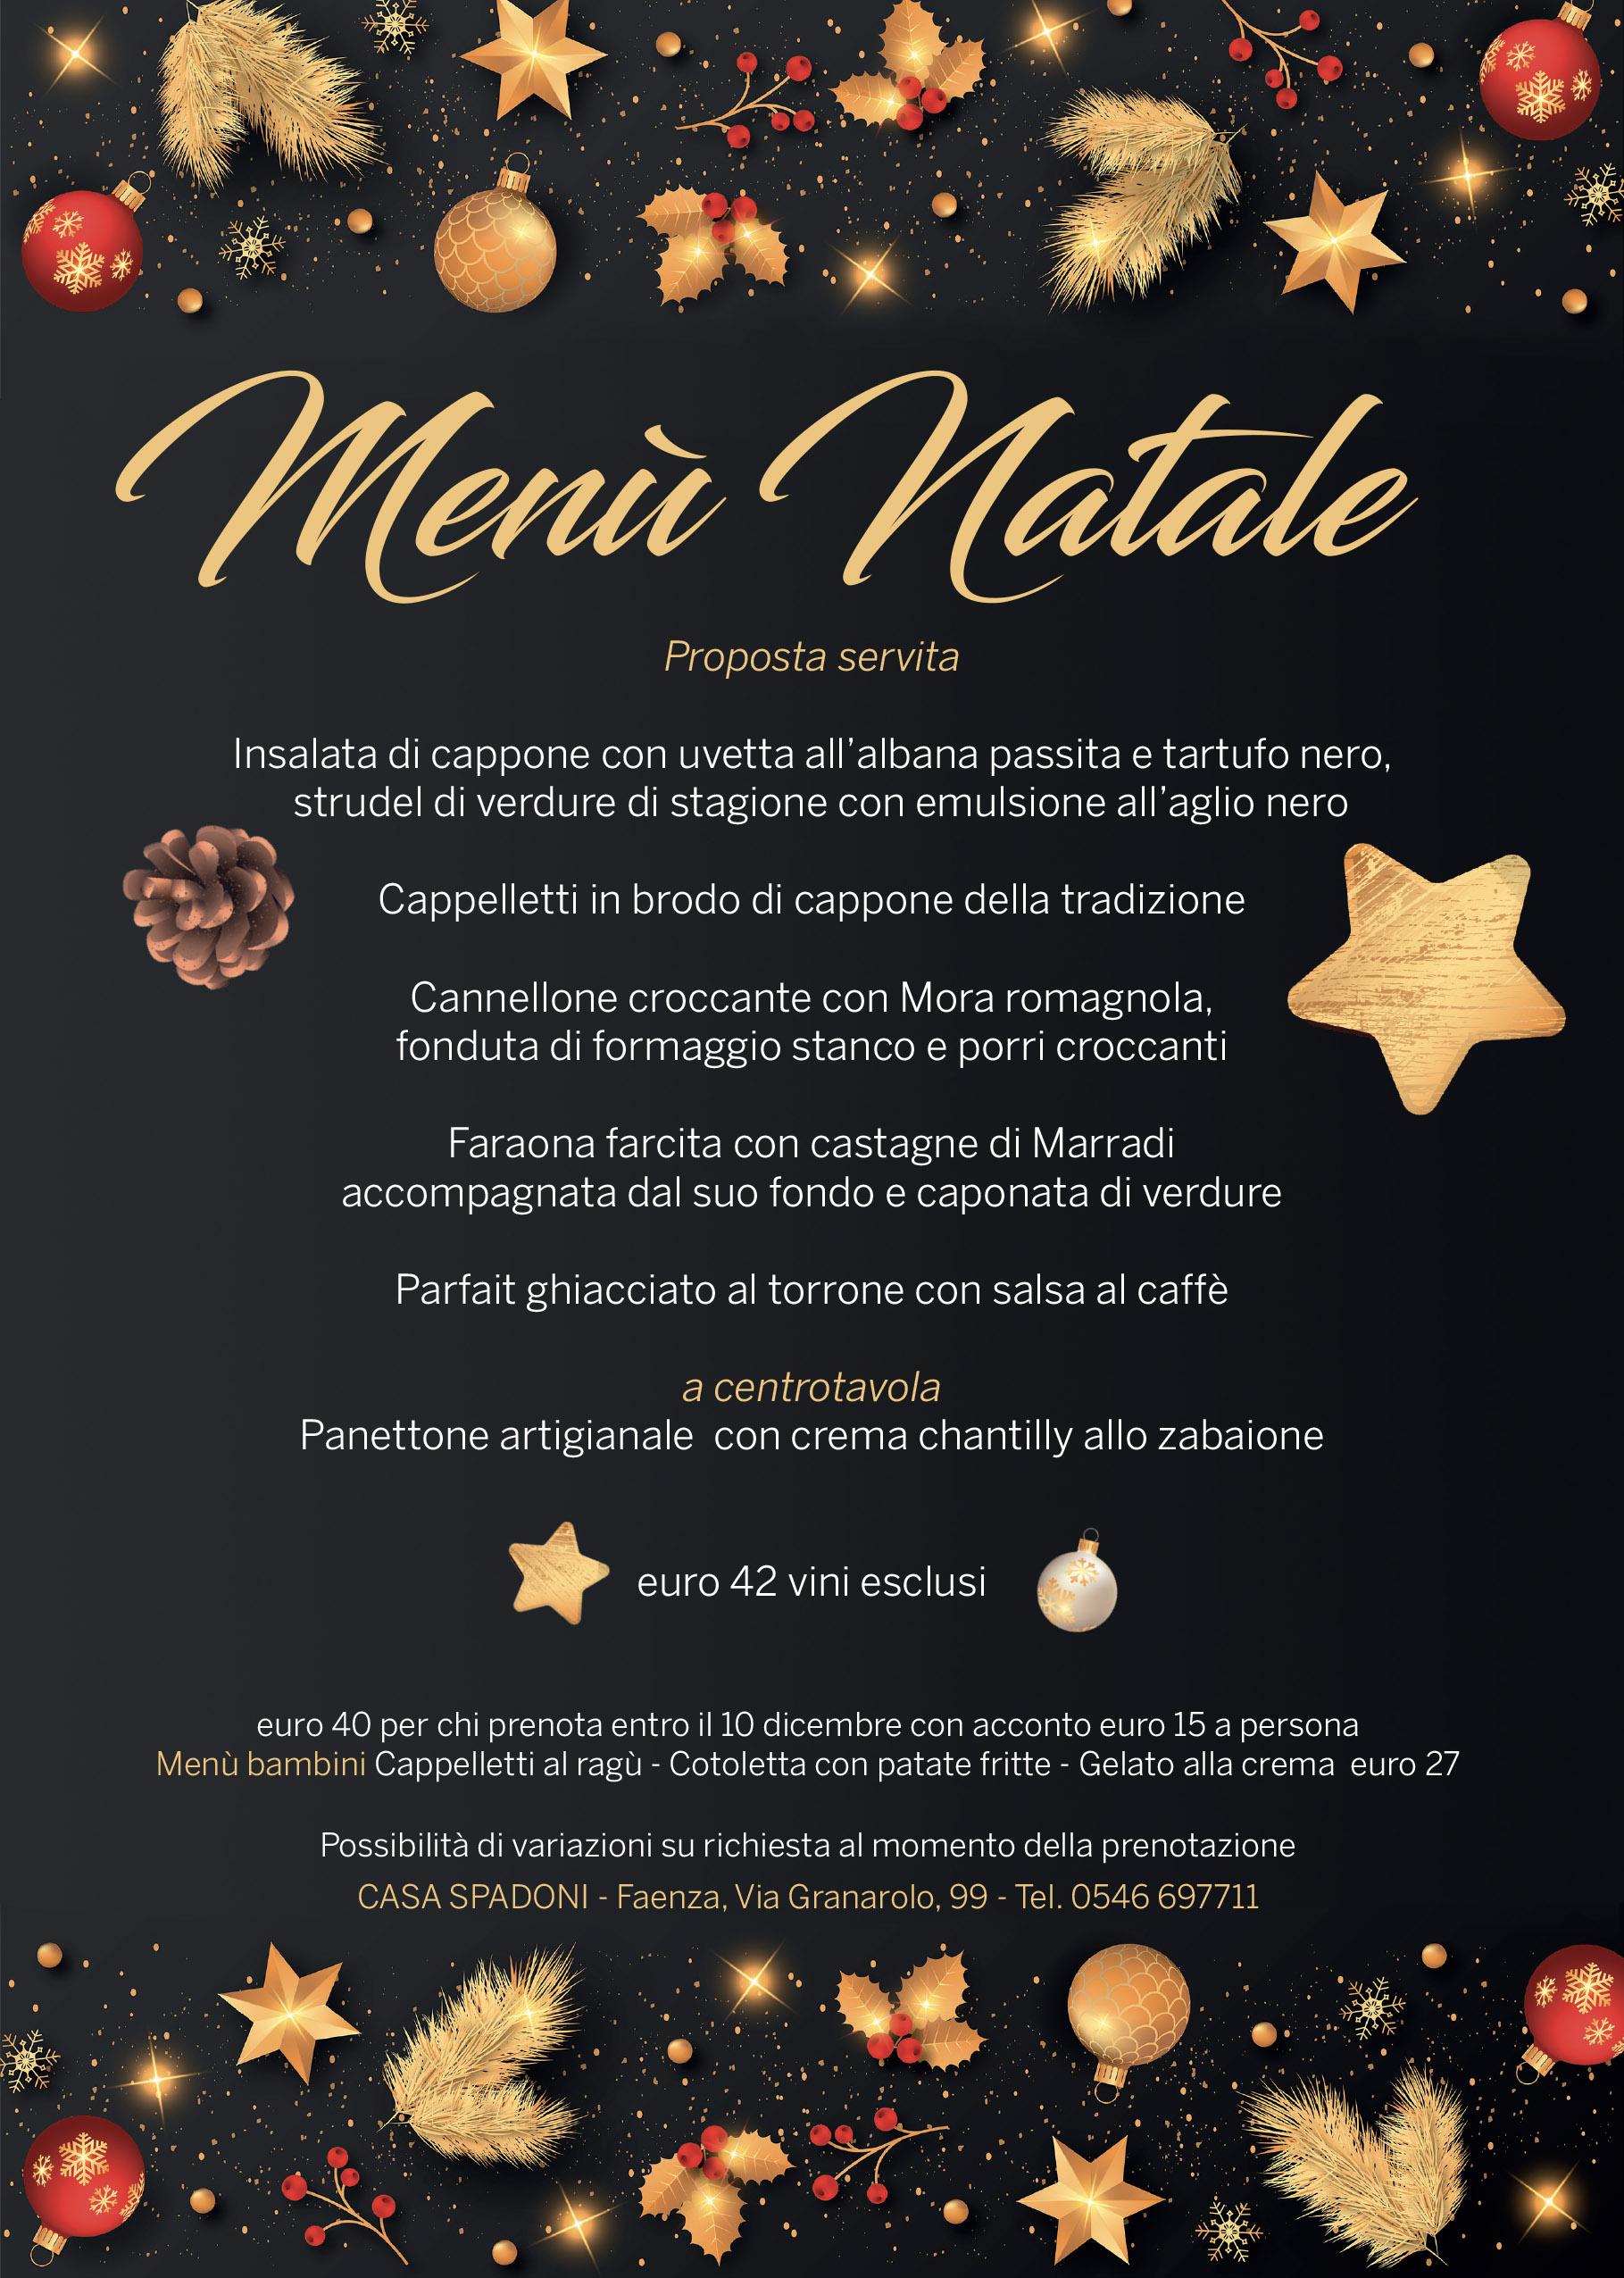 Natale a Casa Spadoni Faenza